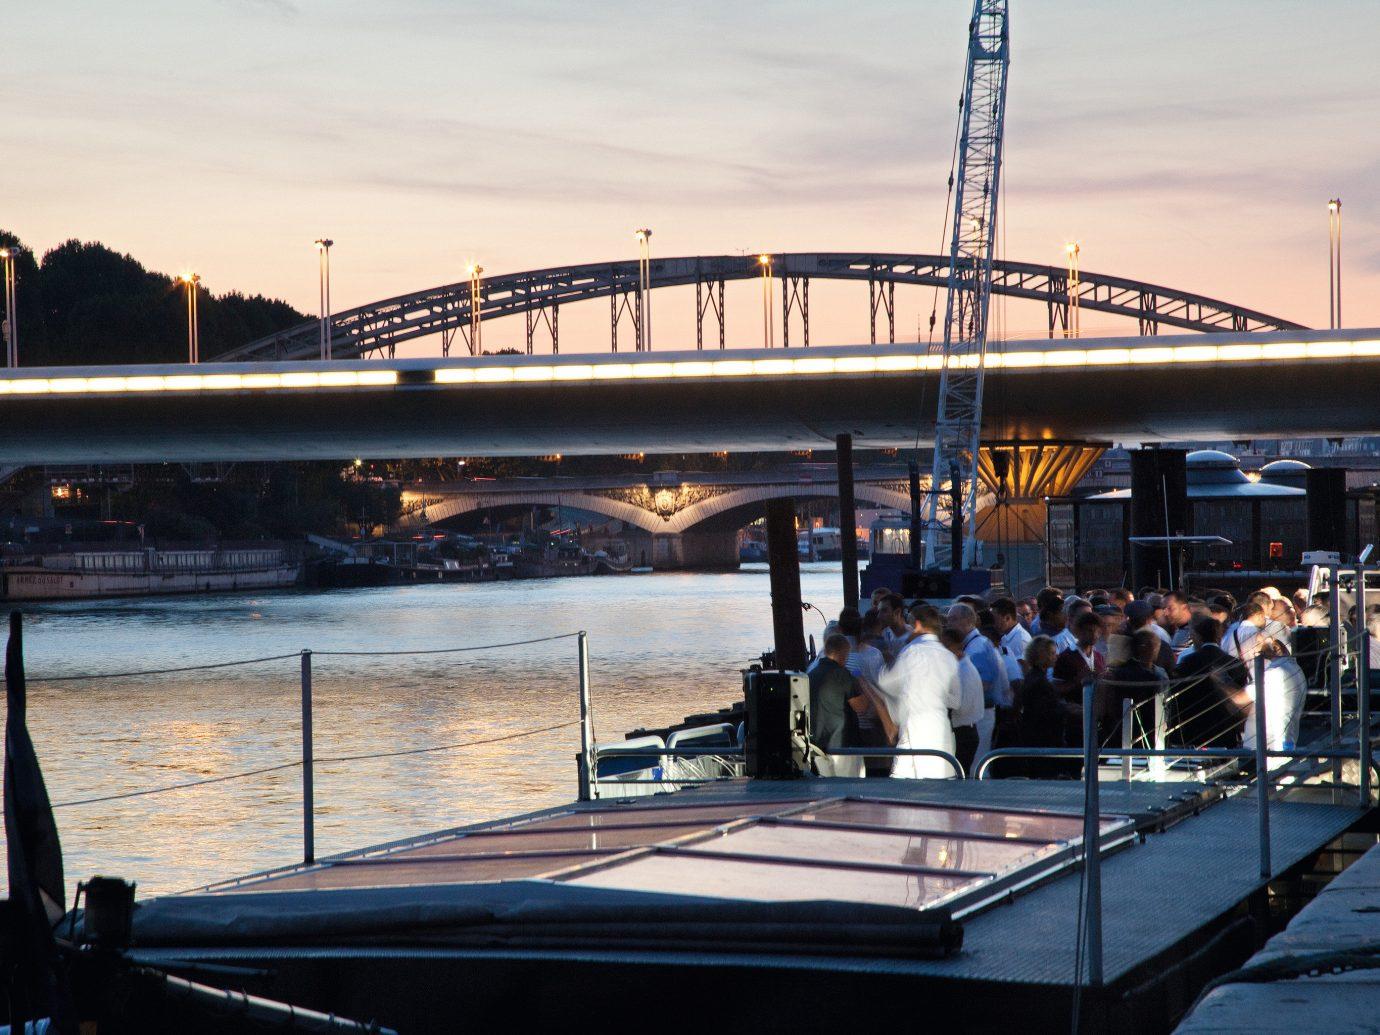 Romance Trip Ideas sky water outdoor bridge Boat transport vehicle River pier reflection dock evening docked